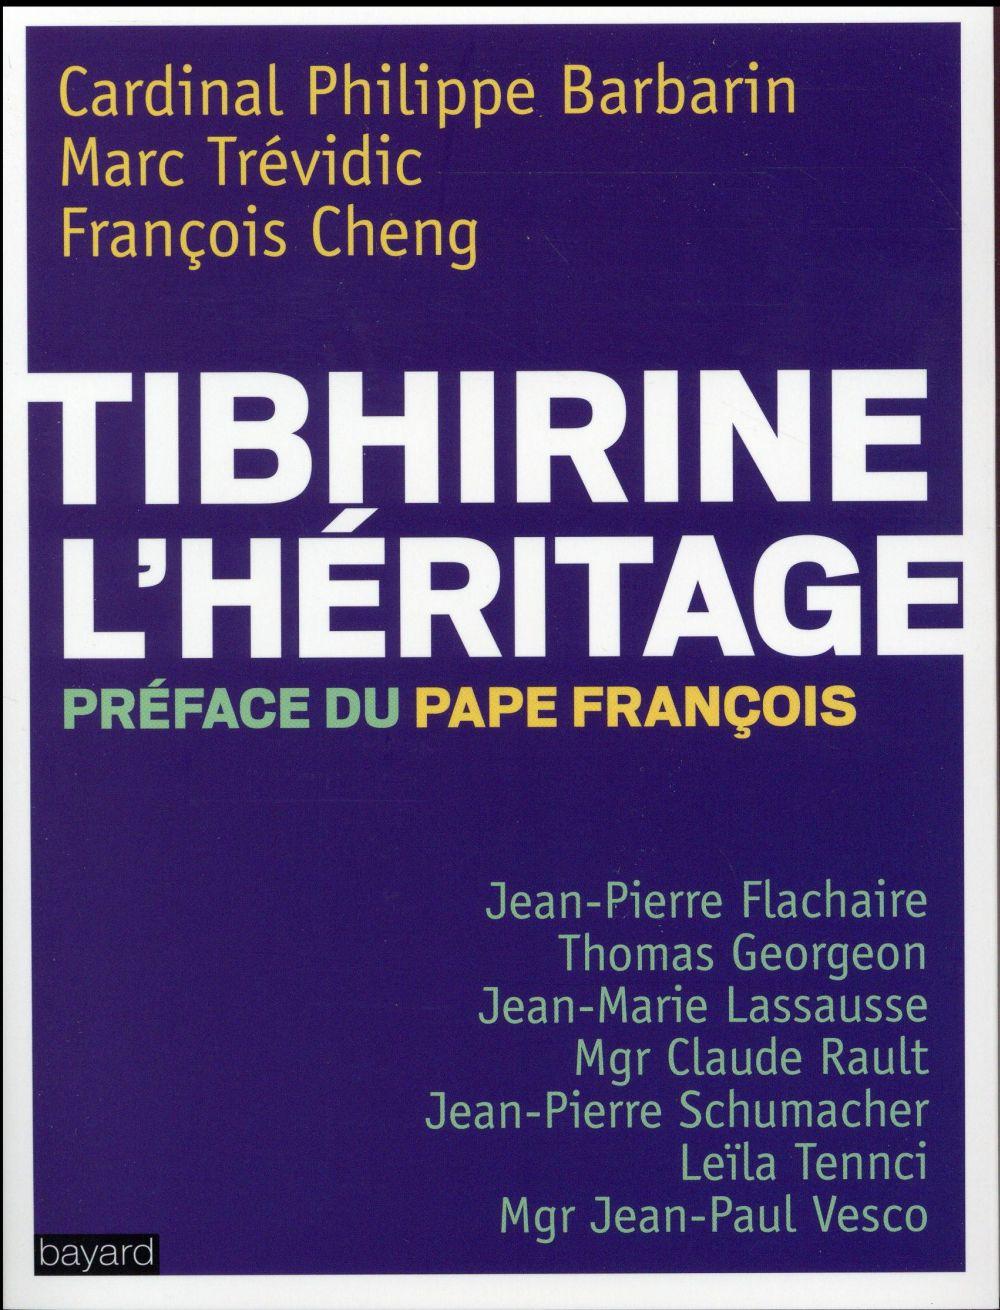 TIBHIRINE : L'HERITAGE